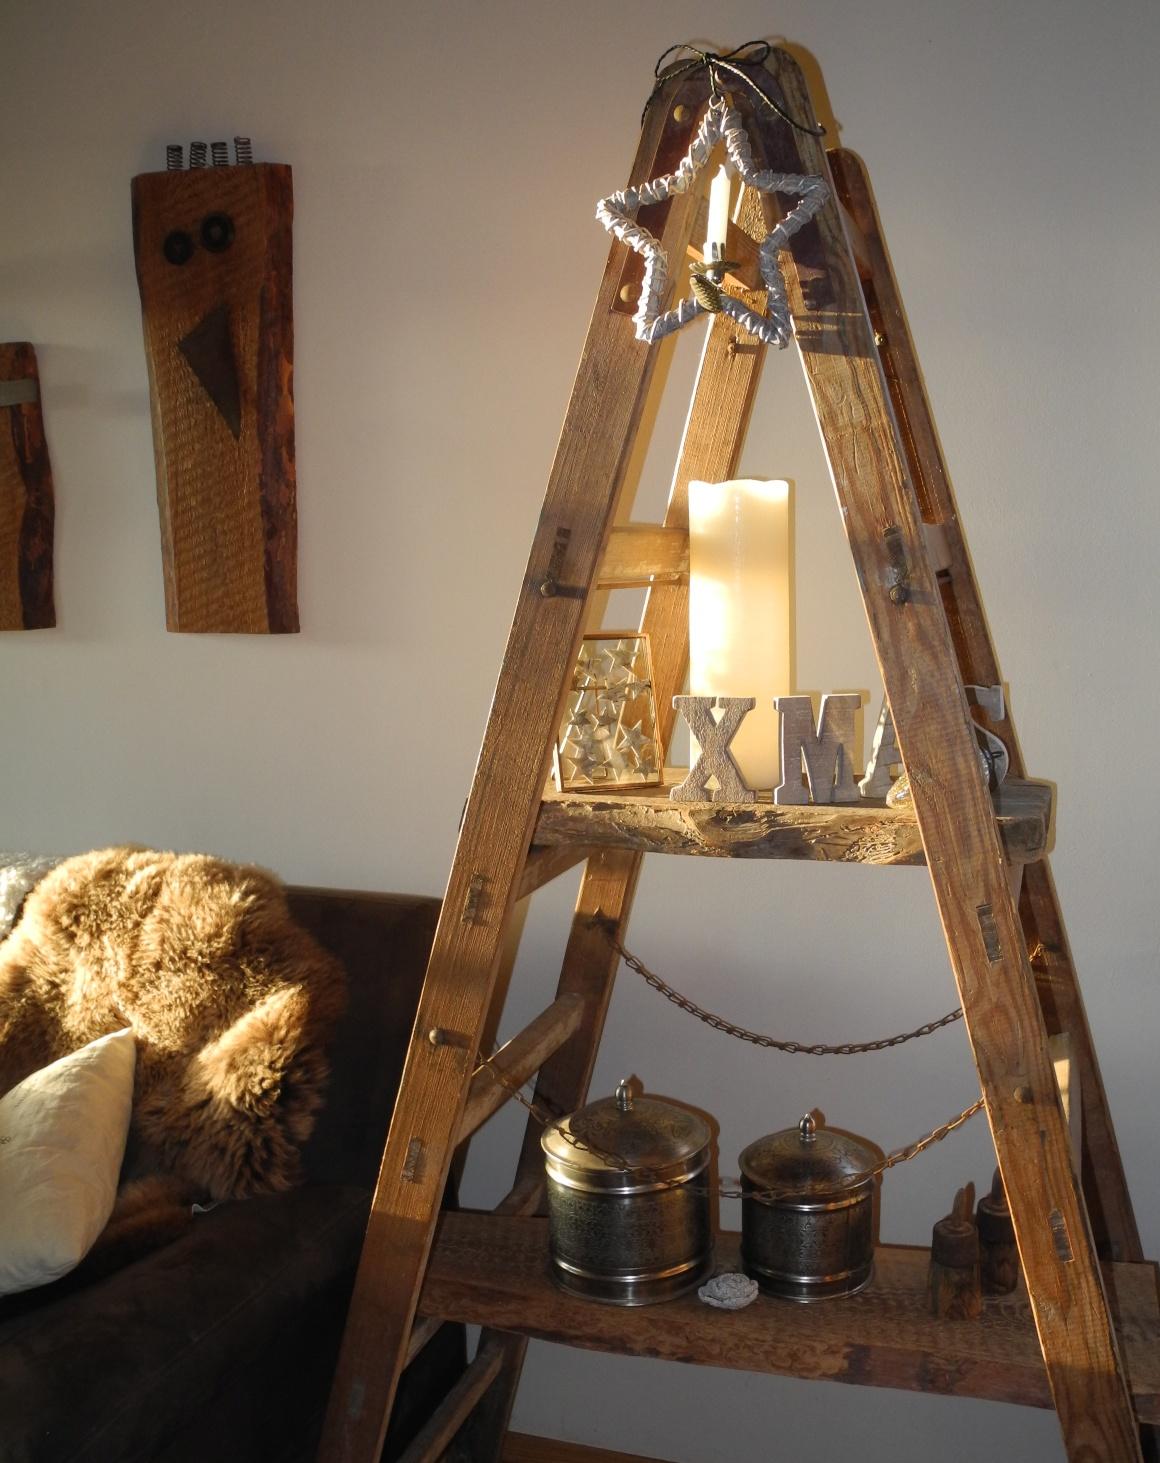 schmiedegarten 1 advent. Black Bedroom Furniture Sets. Home Design Ideas